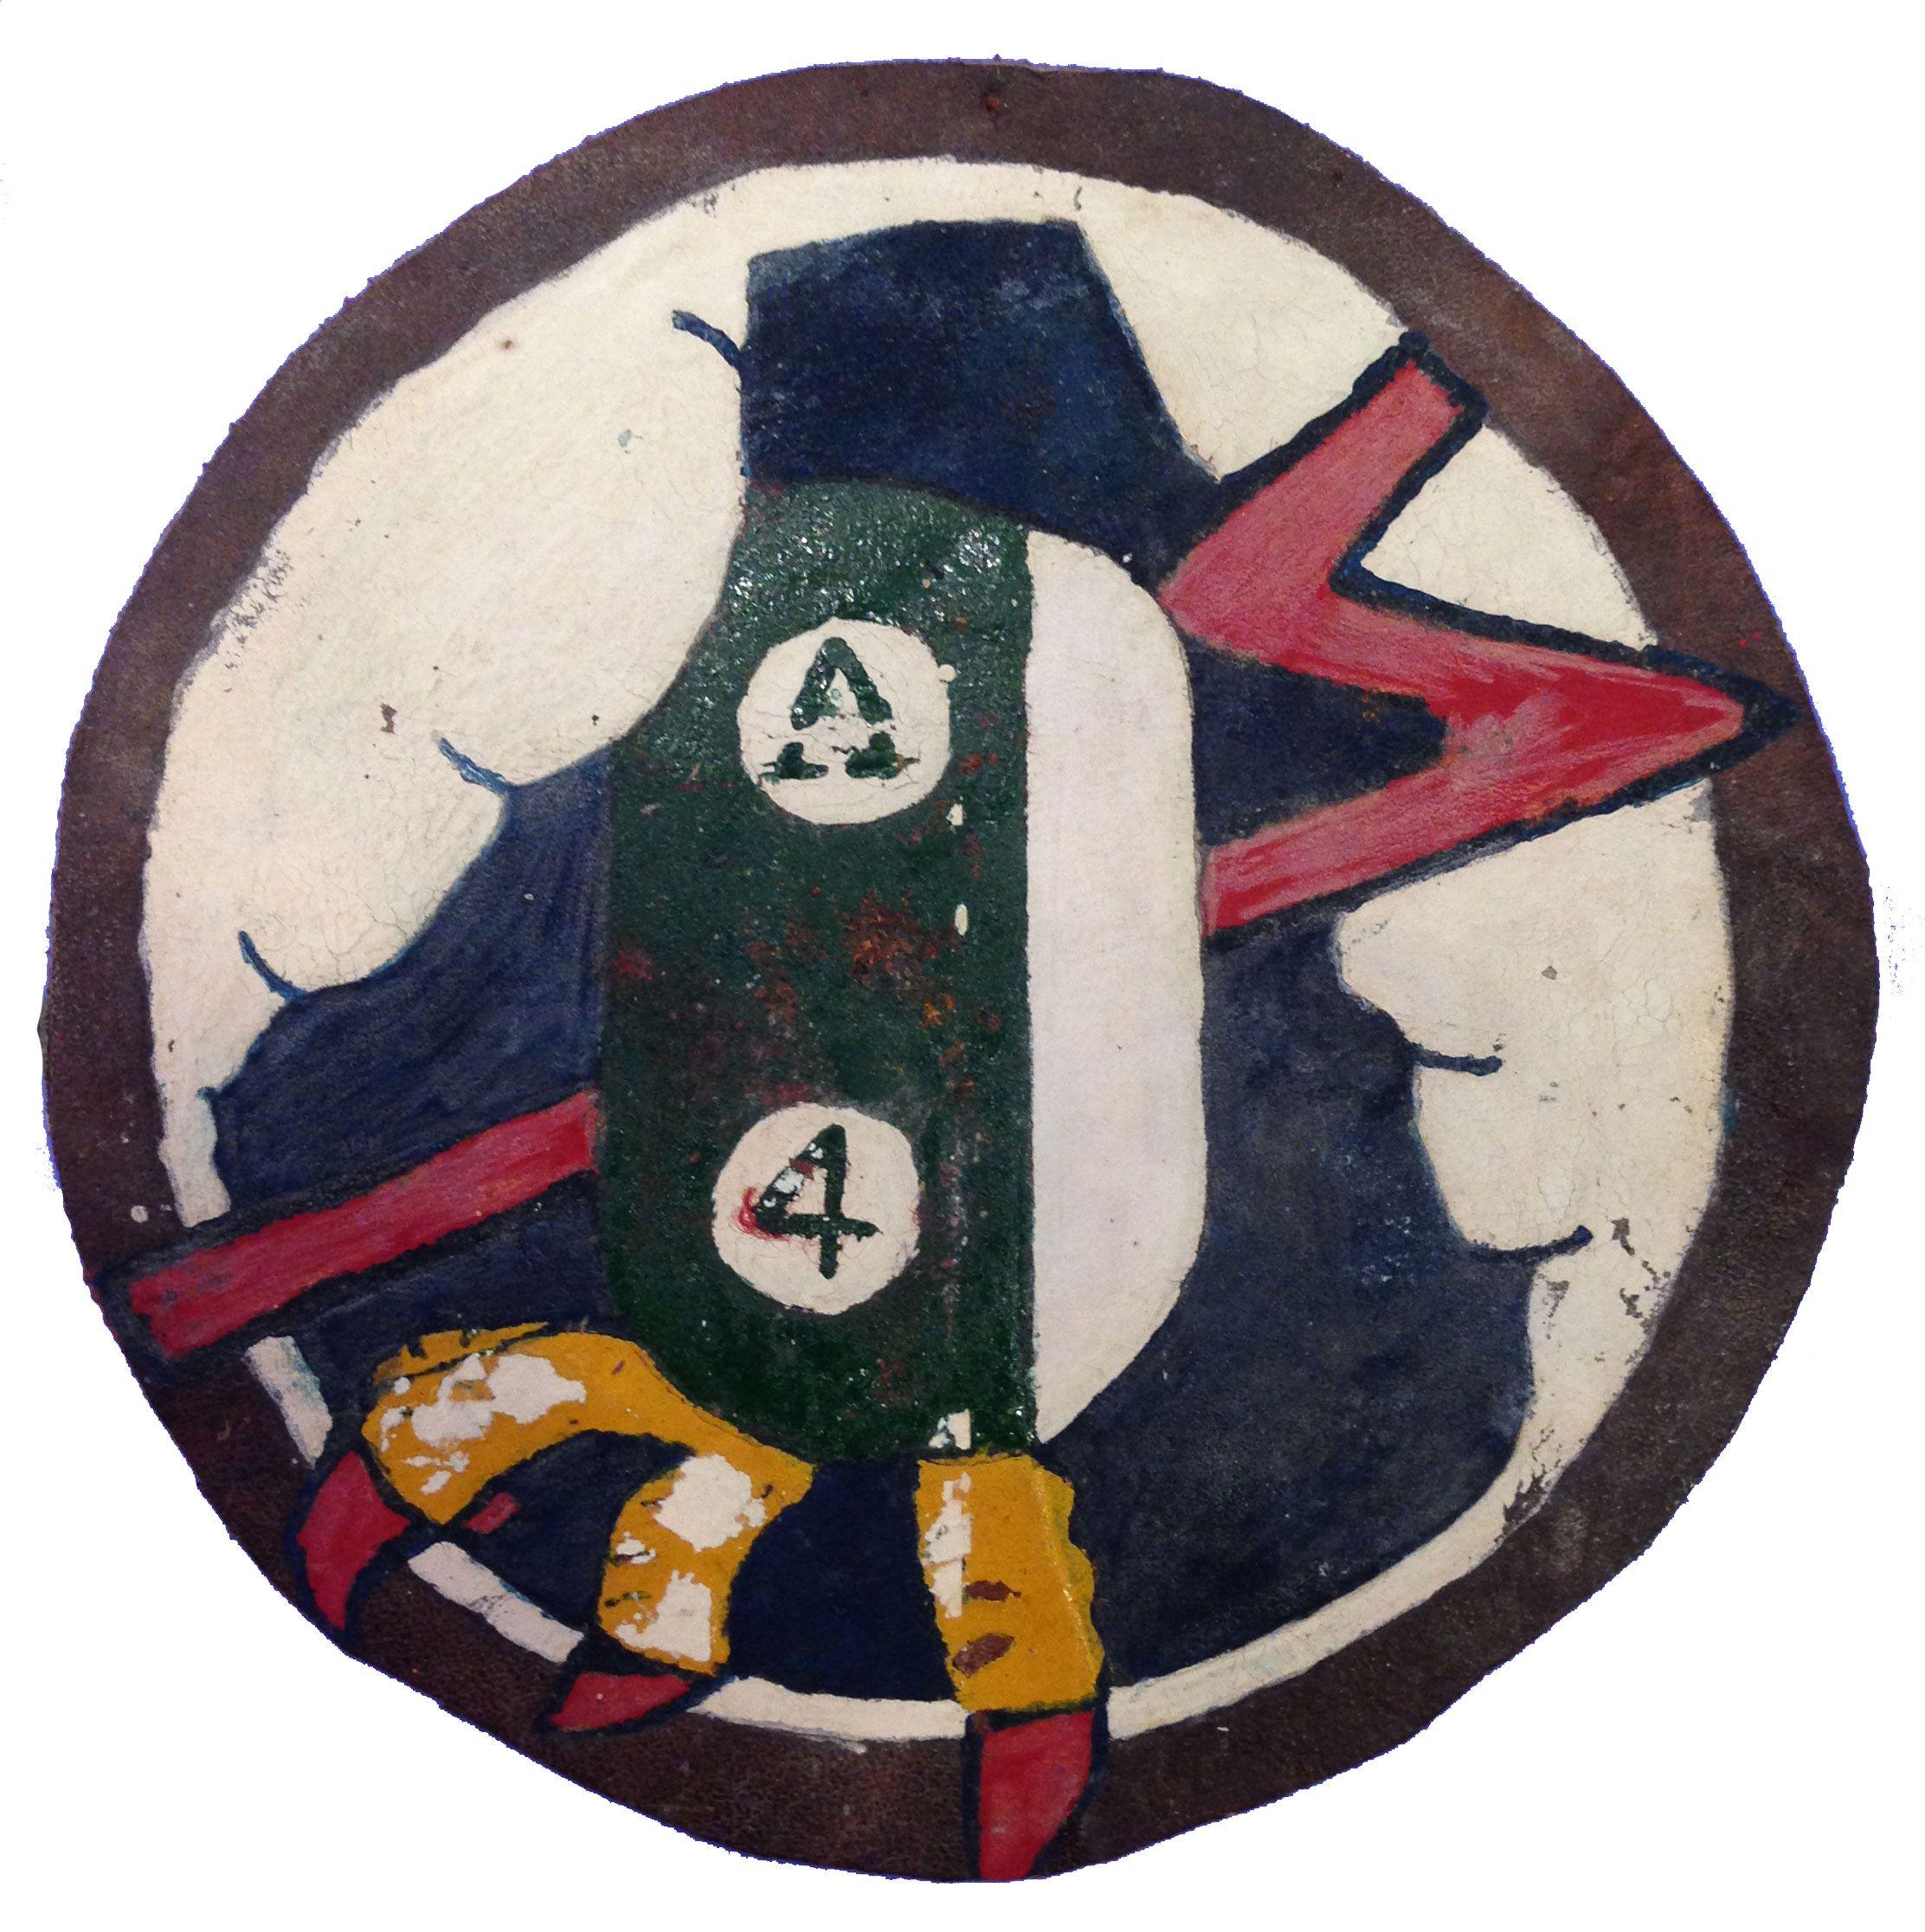 450th Bombardment Group, World War II, B24, aircraft